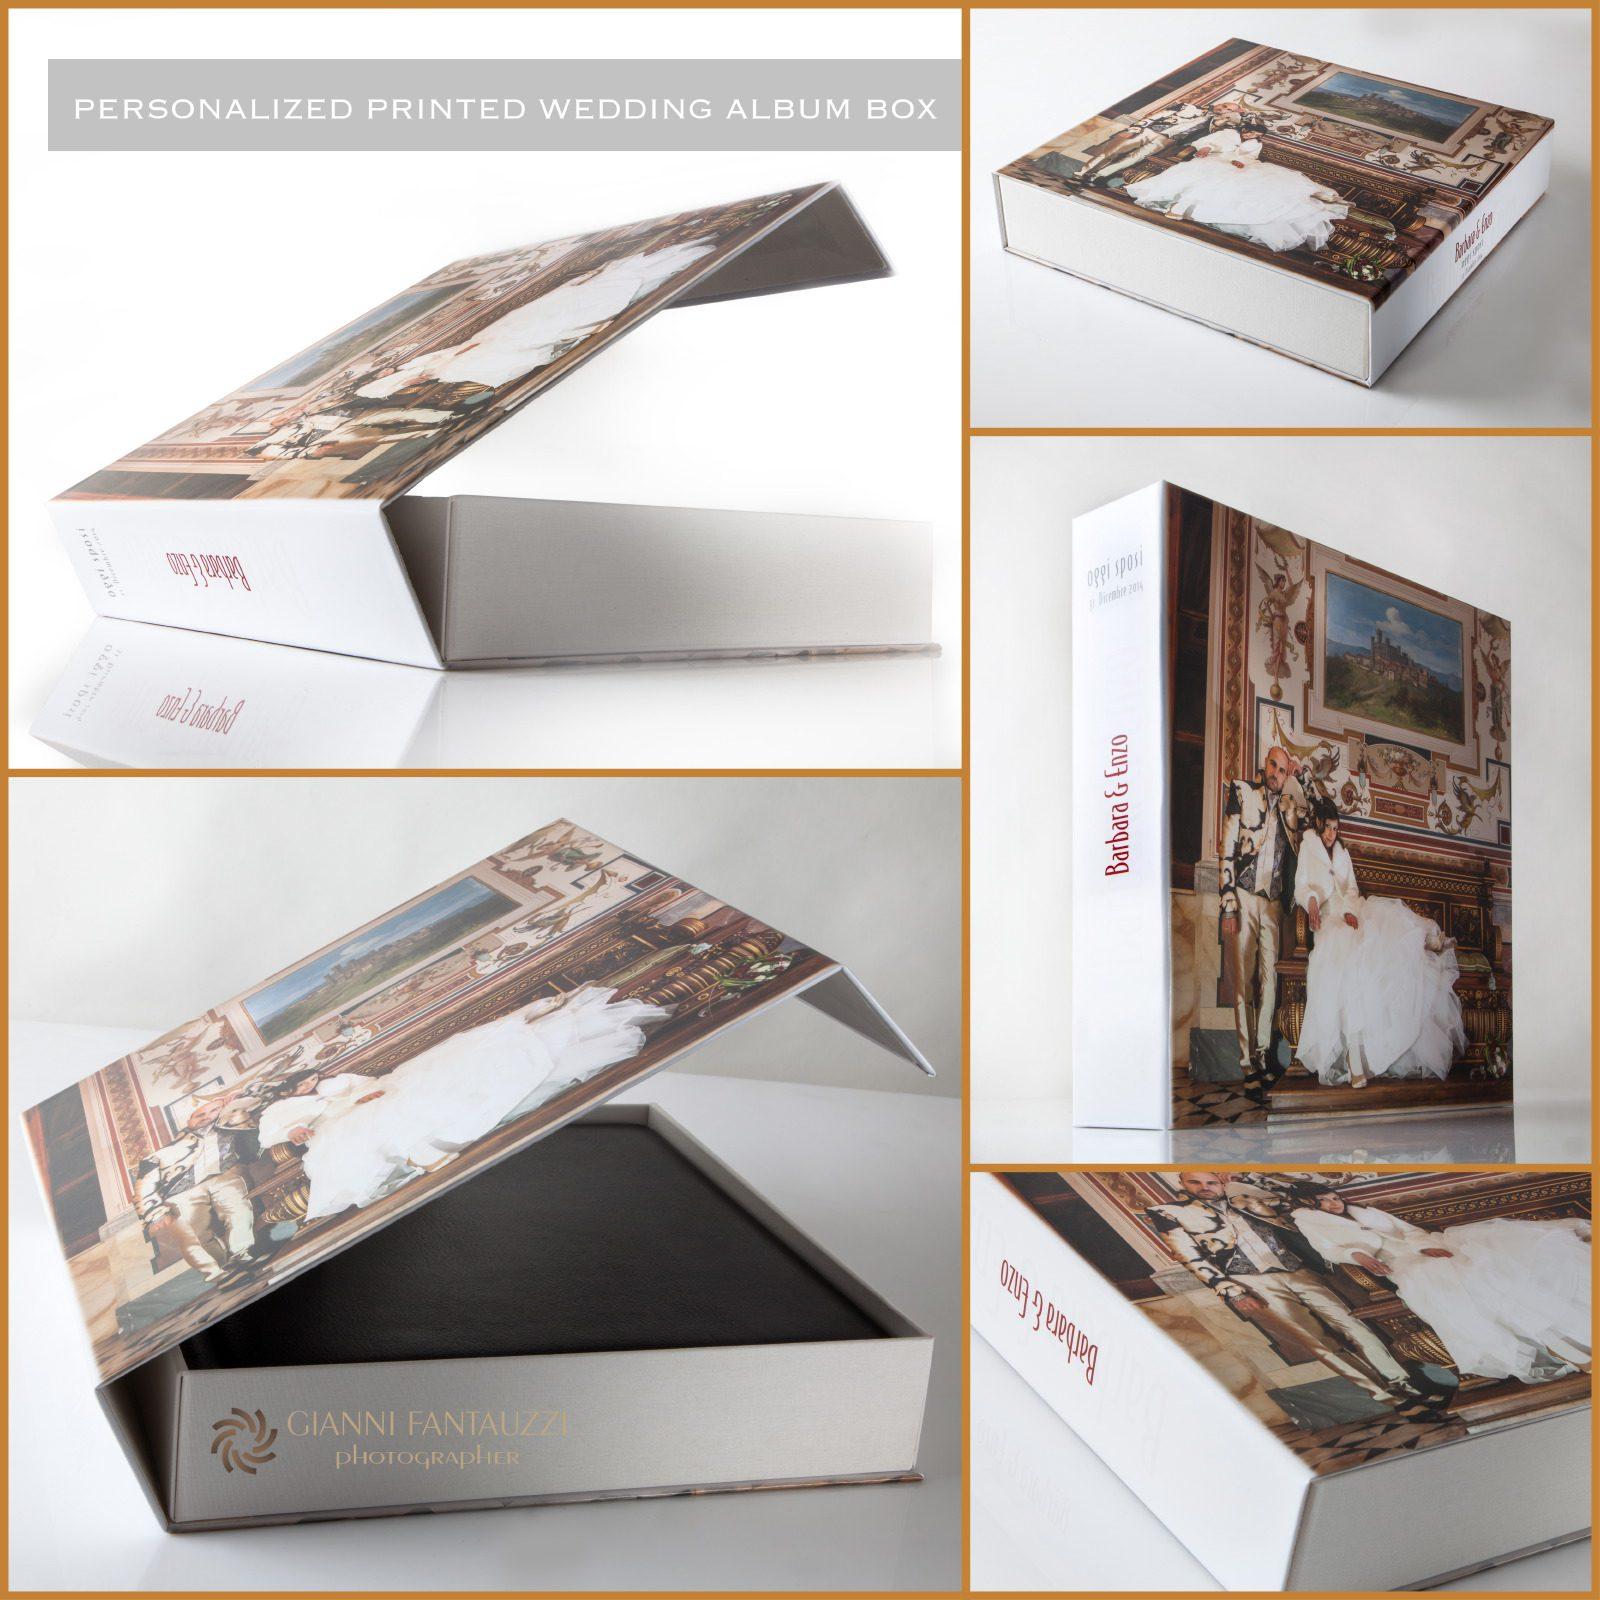 PRINTED WEDDING ALBUM BOX